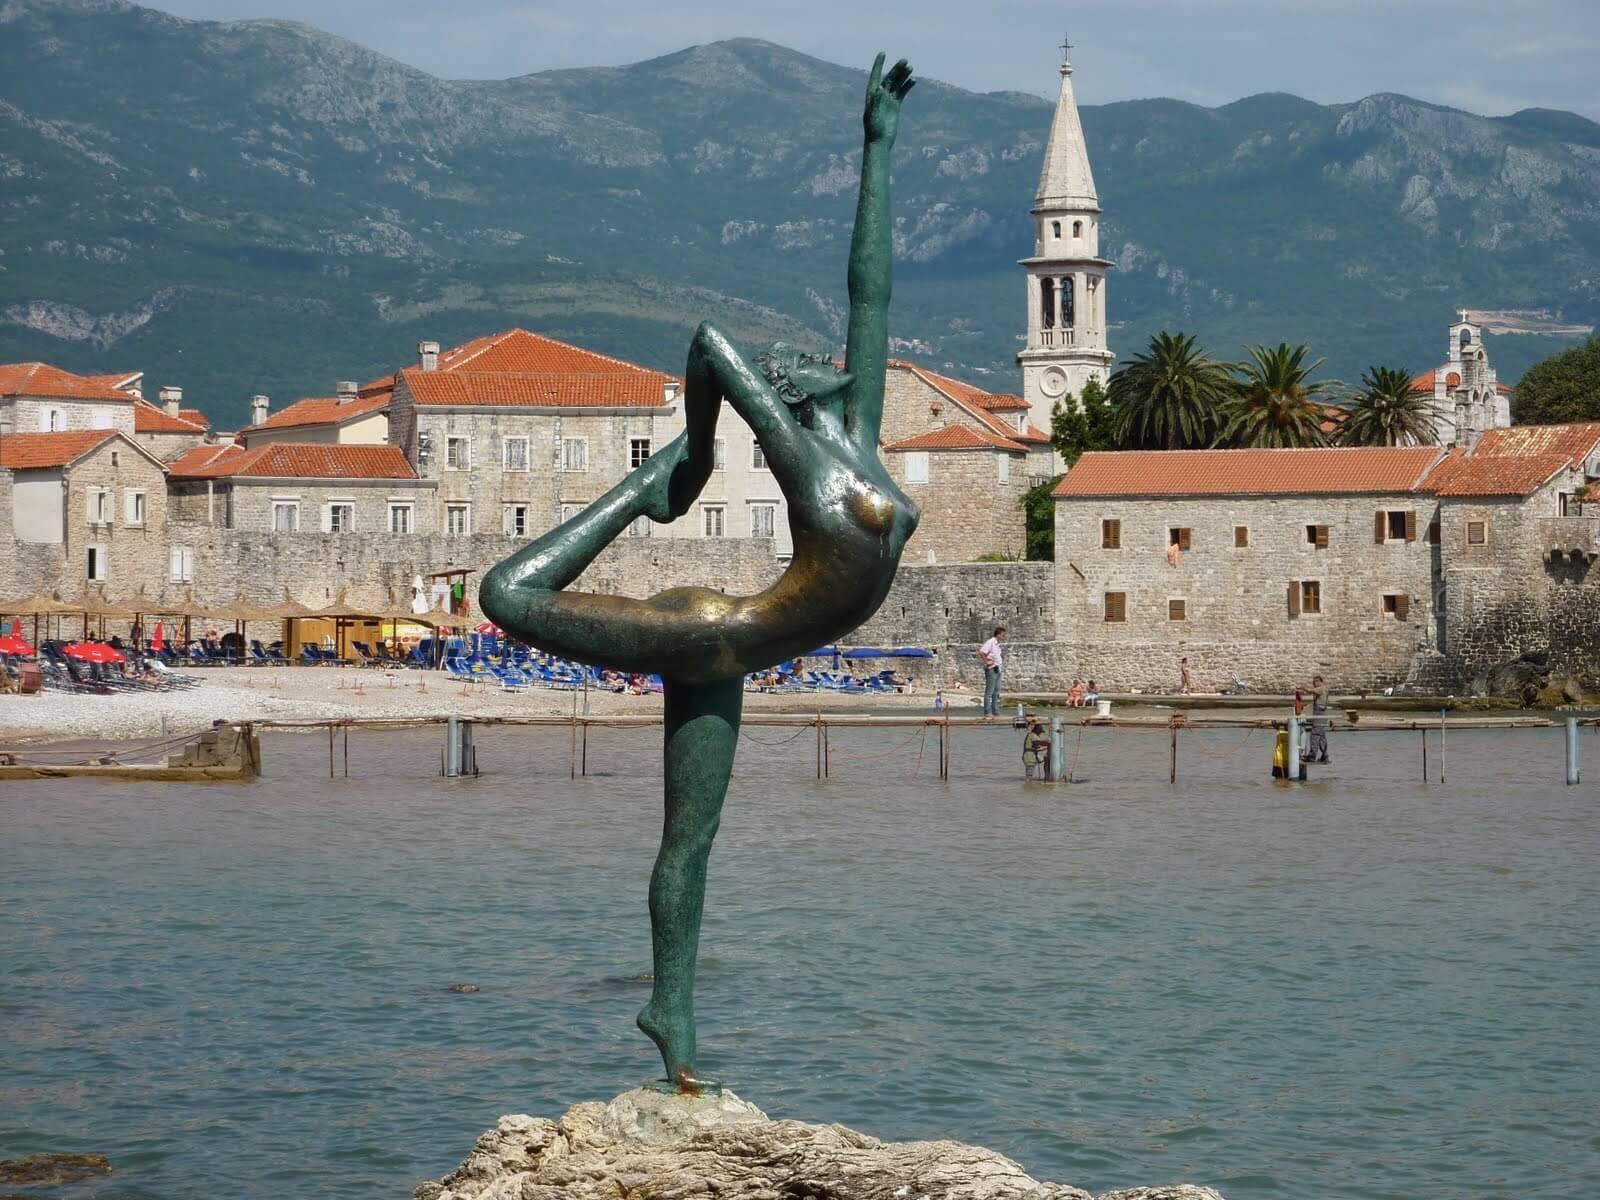 Символ Будвы - статуя балерины